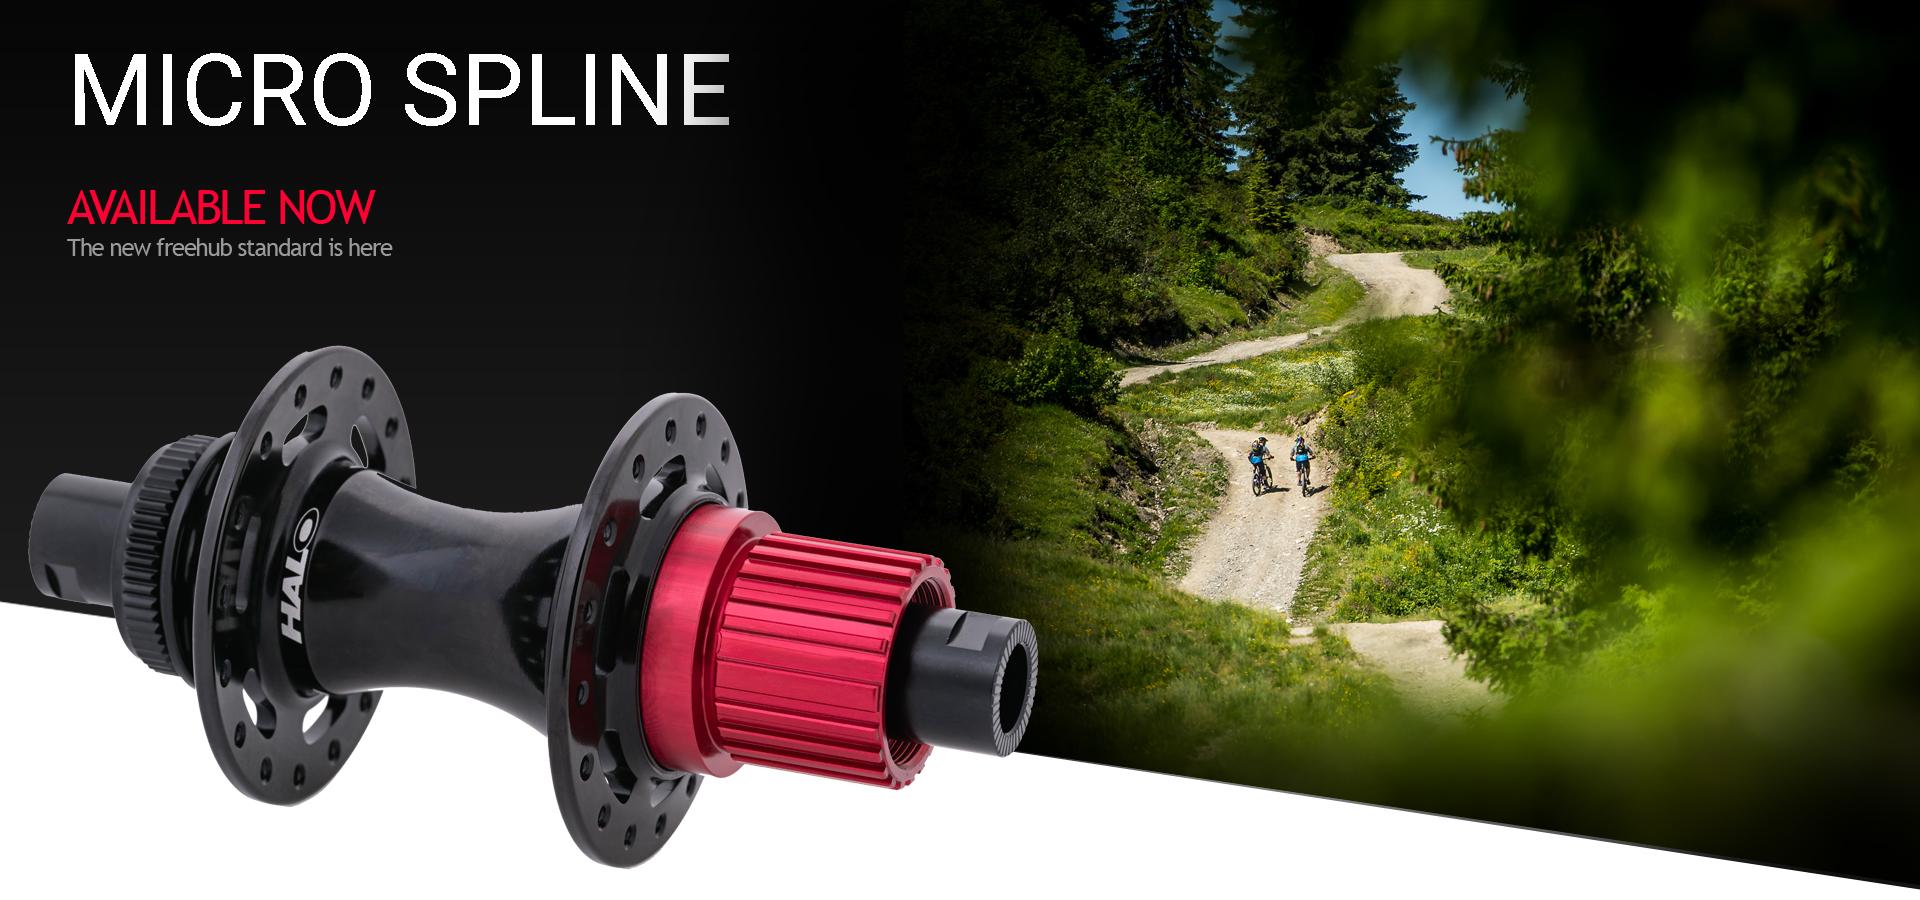 Halo Micro Spline now available